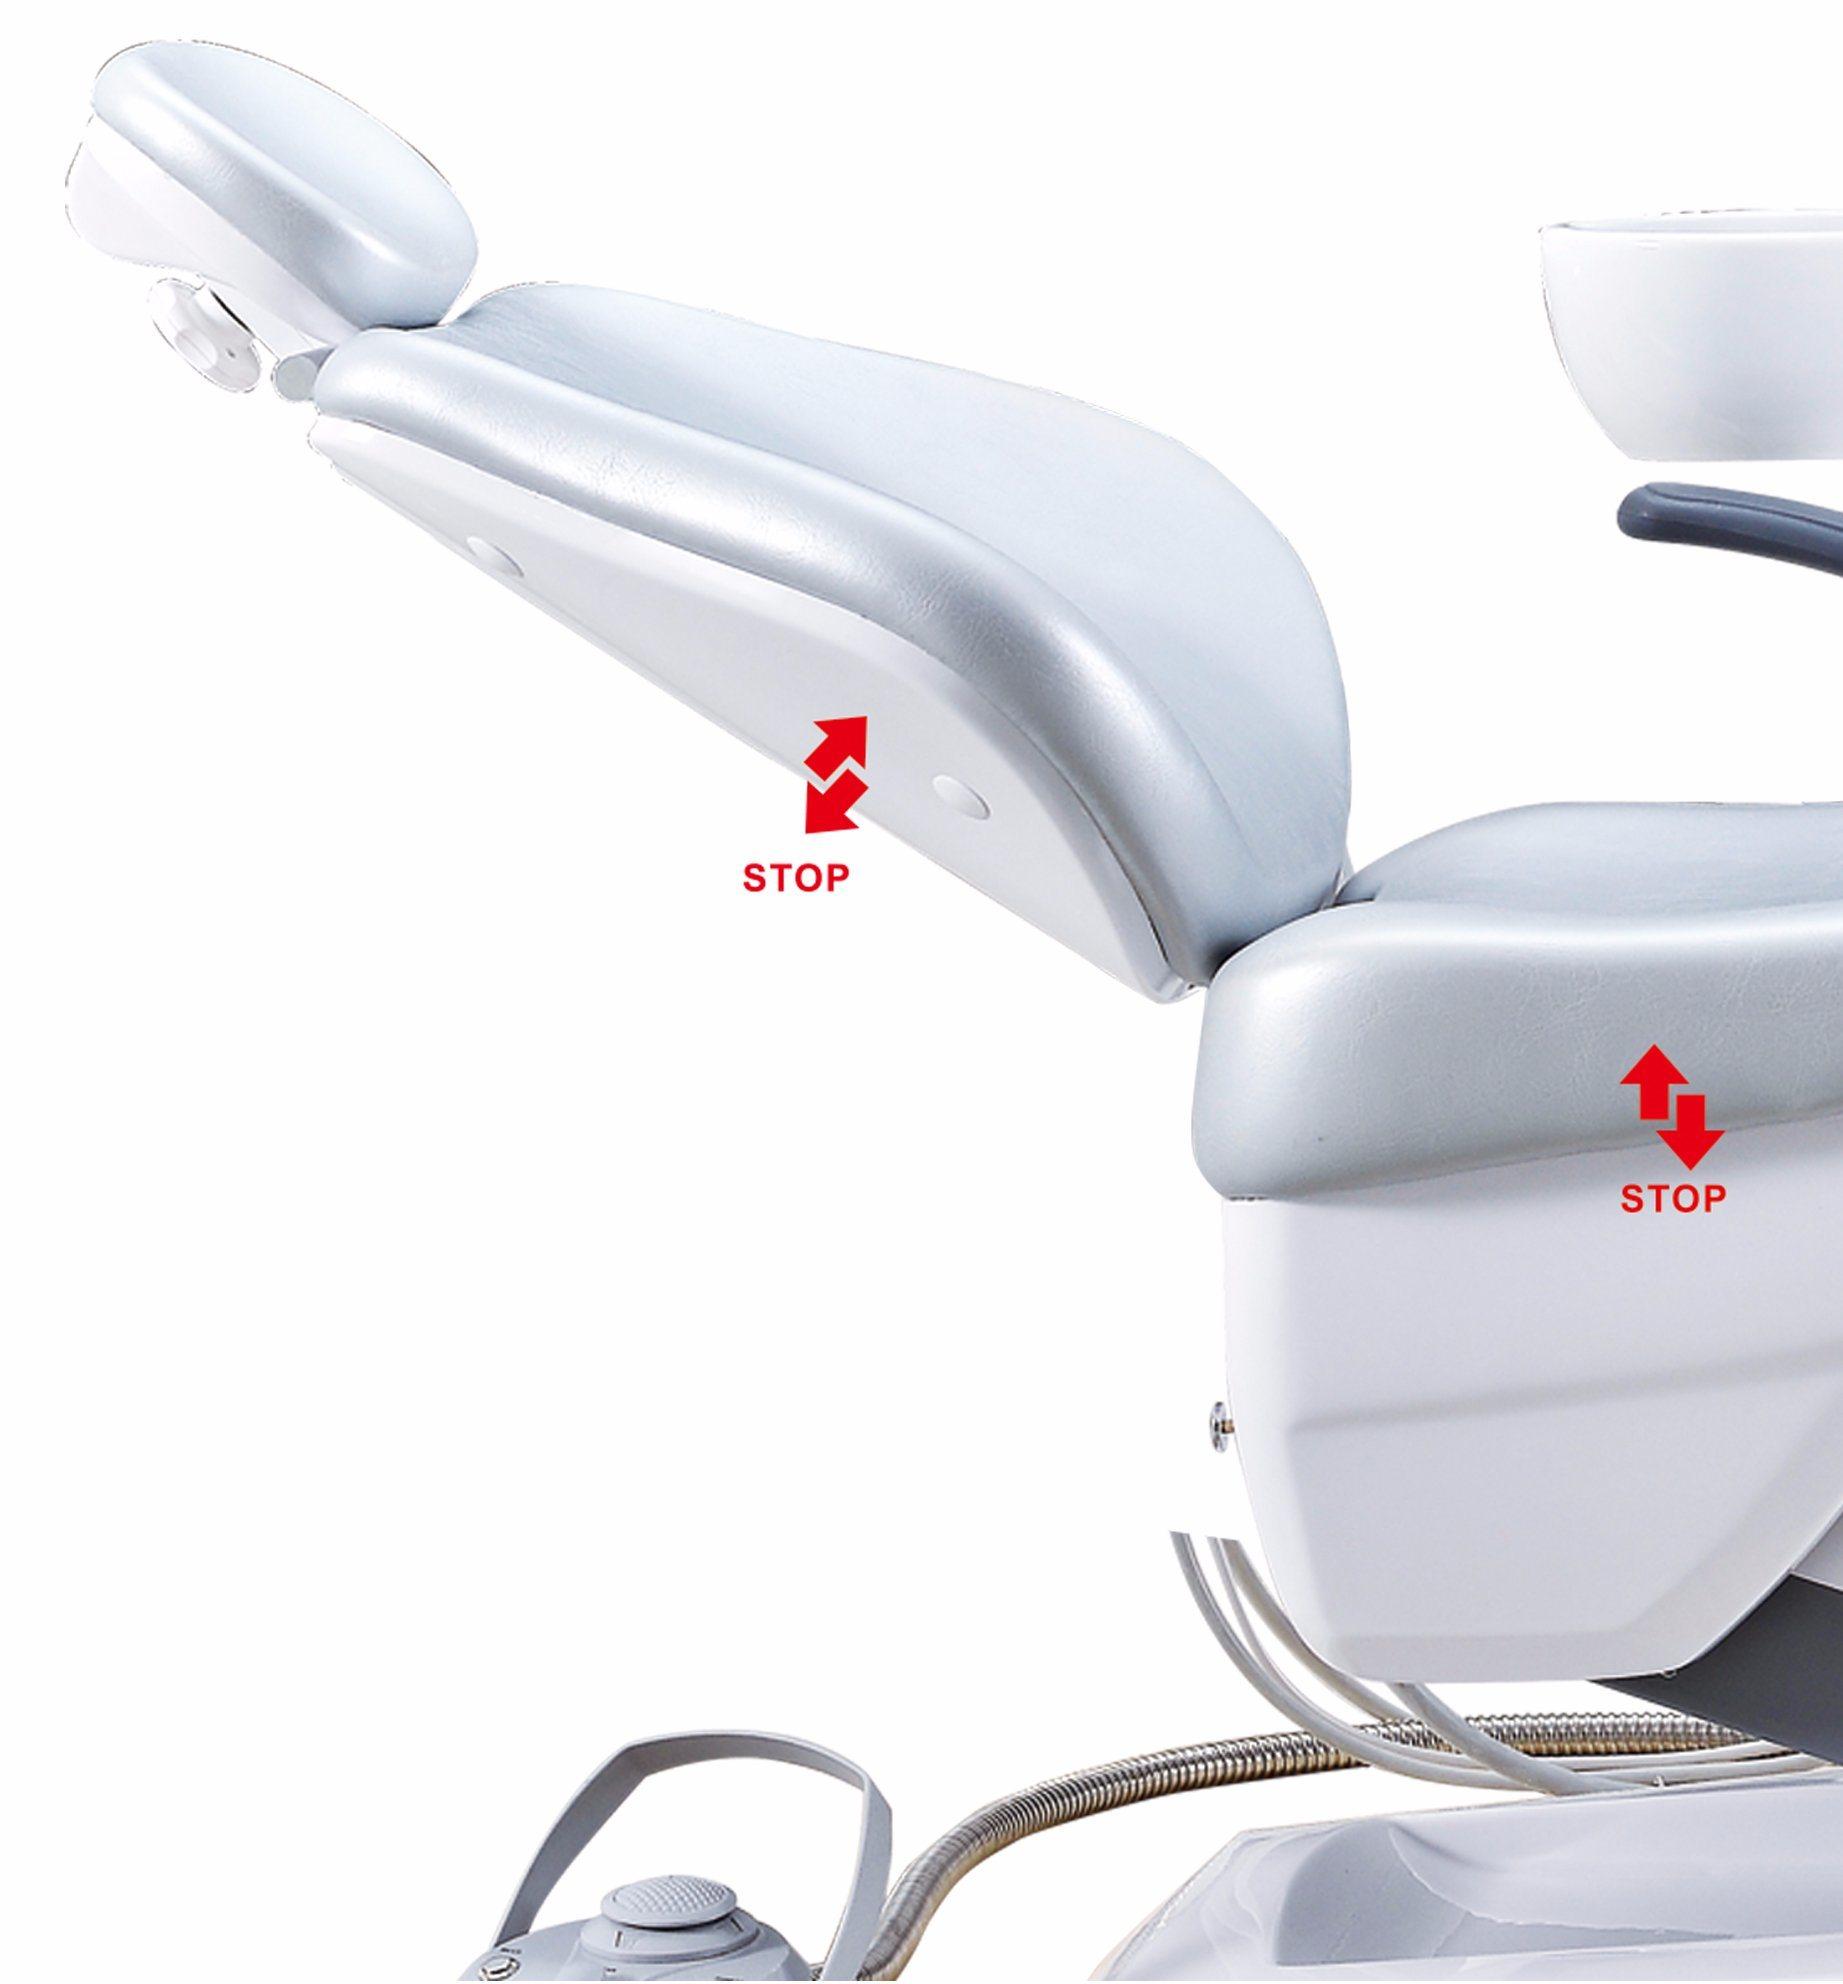 X1 Cingol Dental Chair for Hospital Center